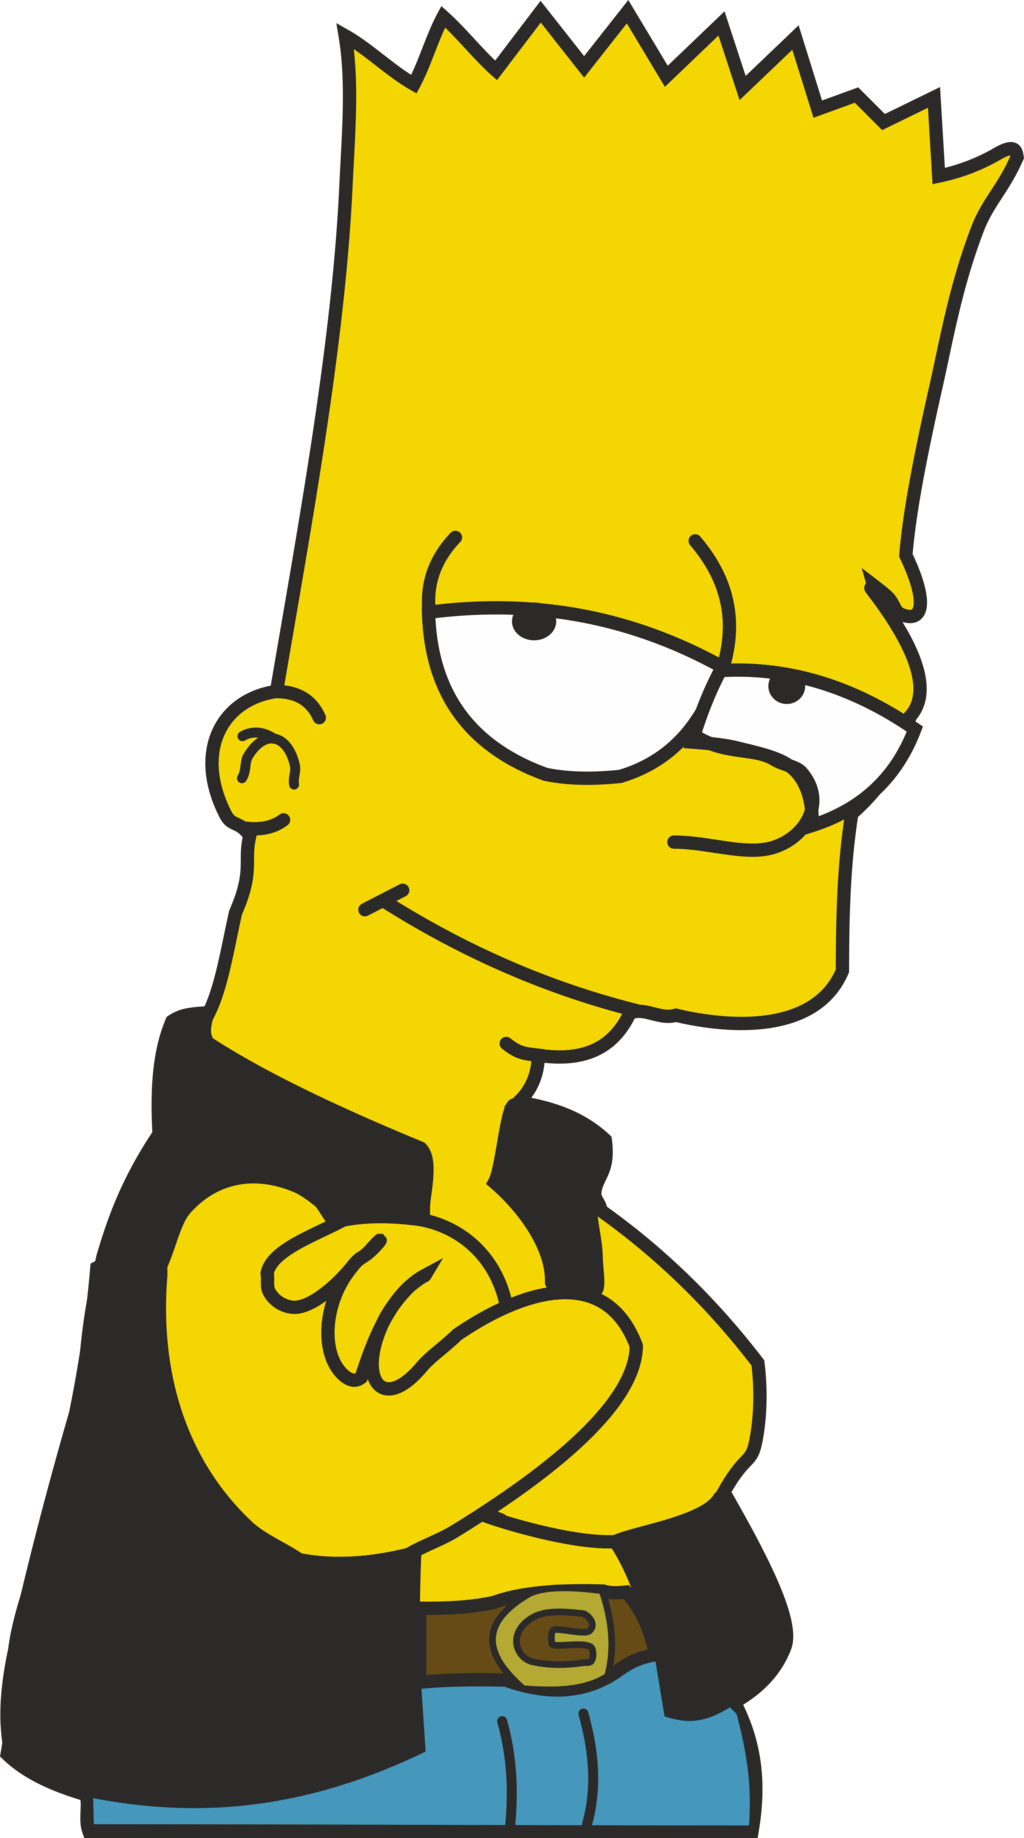 Bart simpson pinterest. Couch clipart simpsons